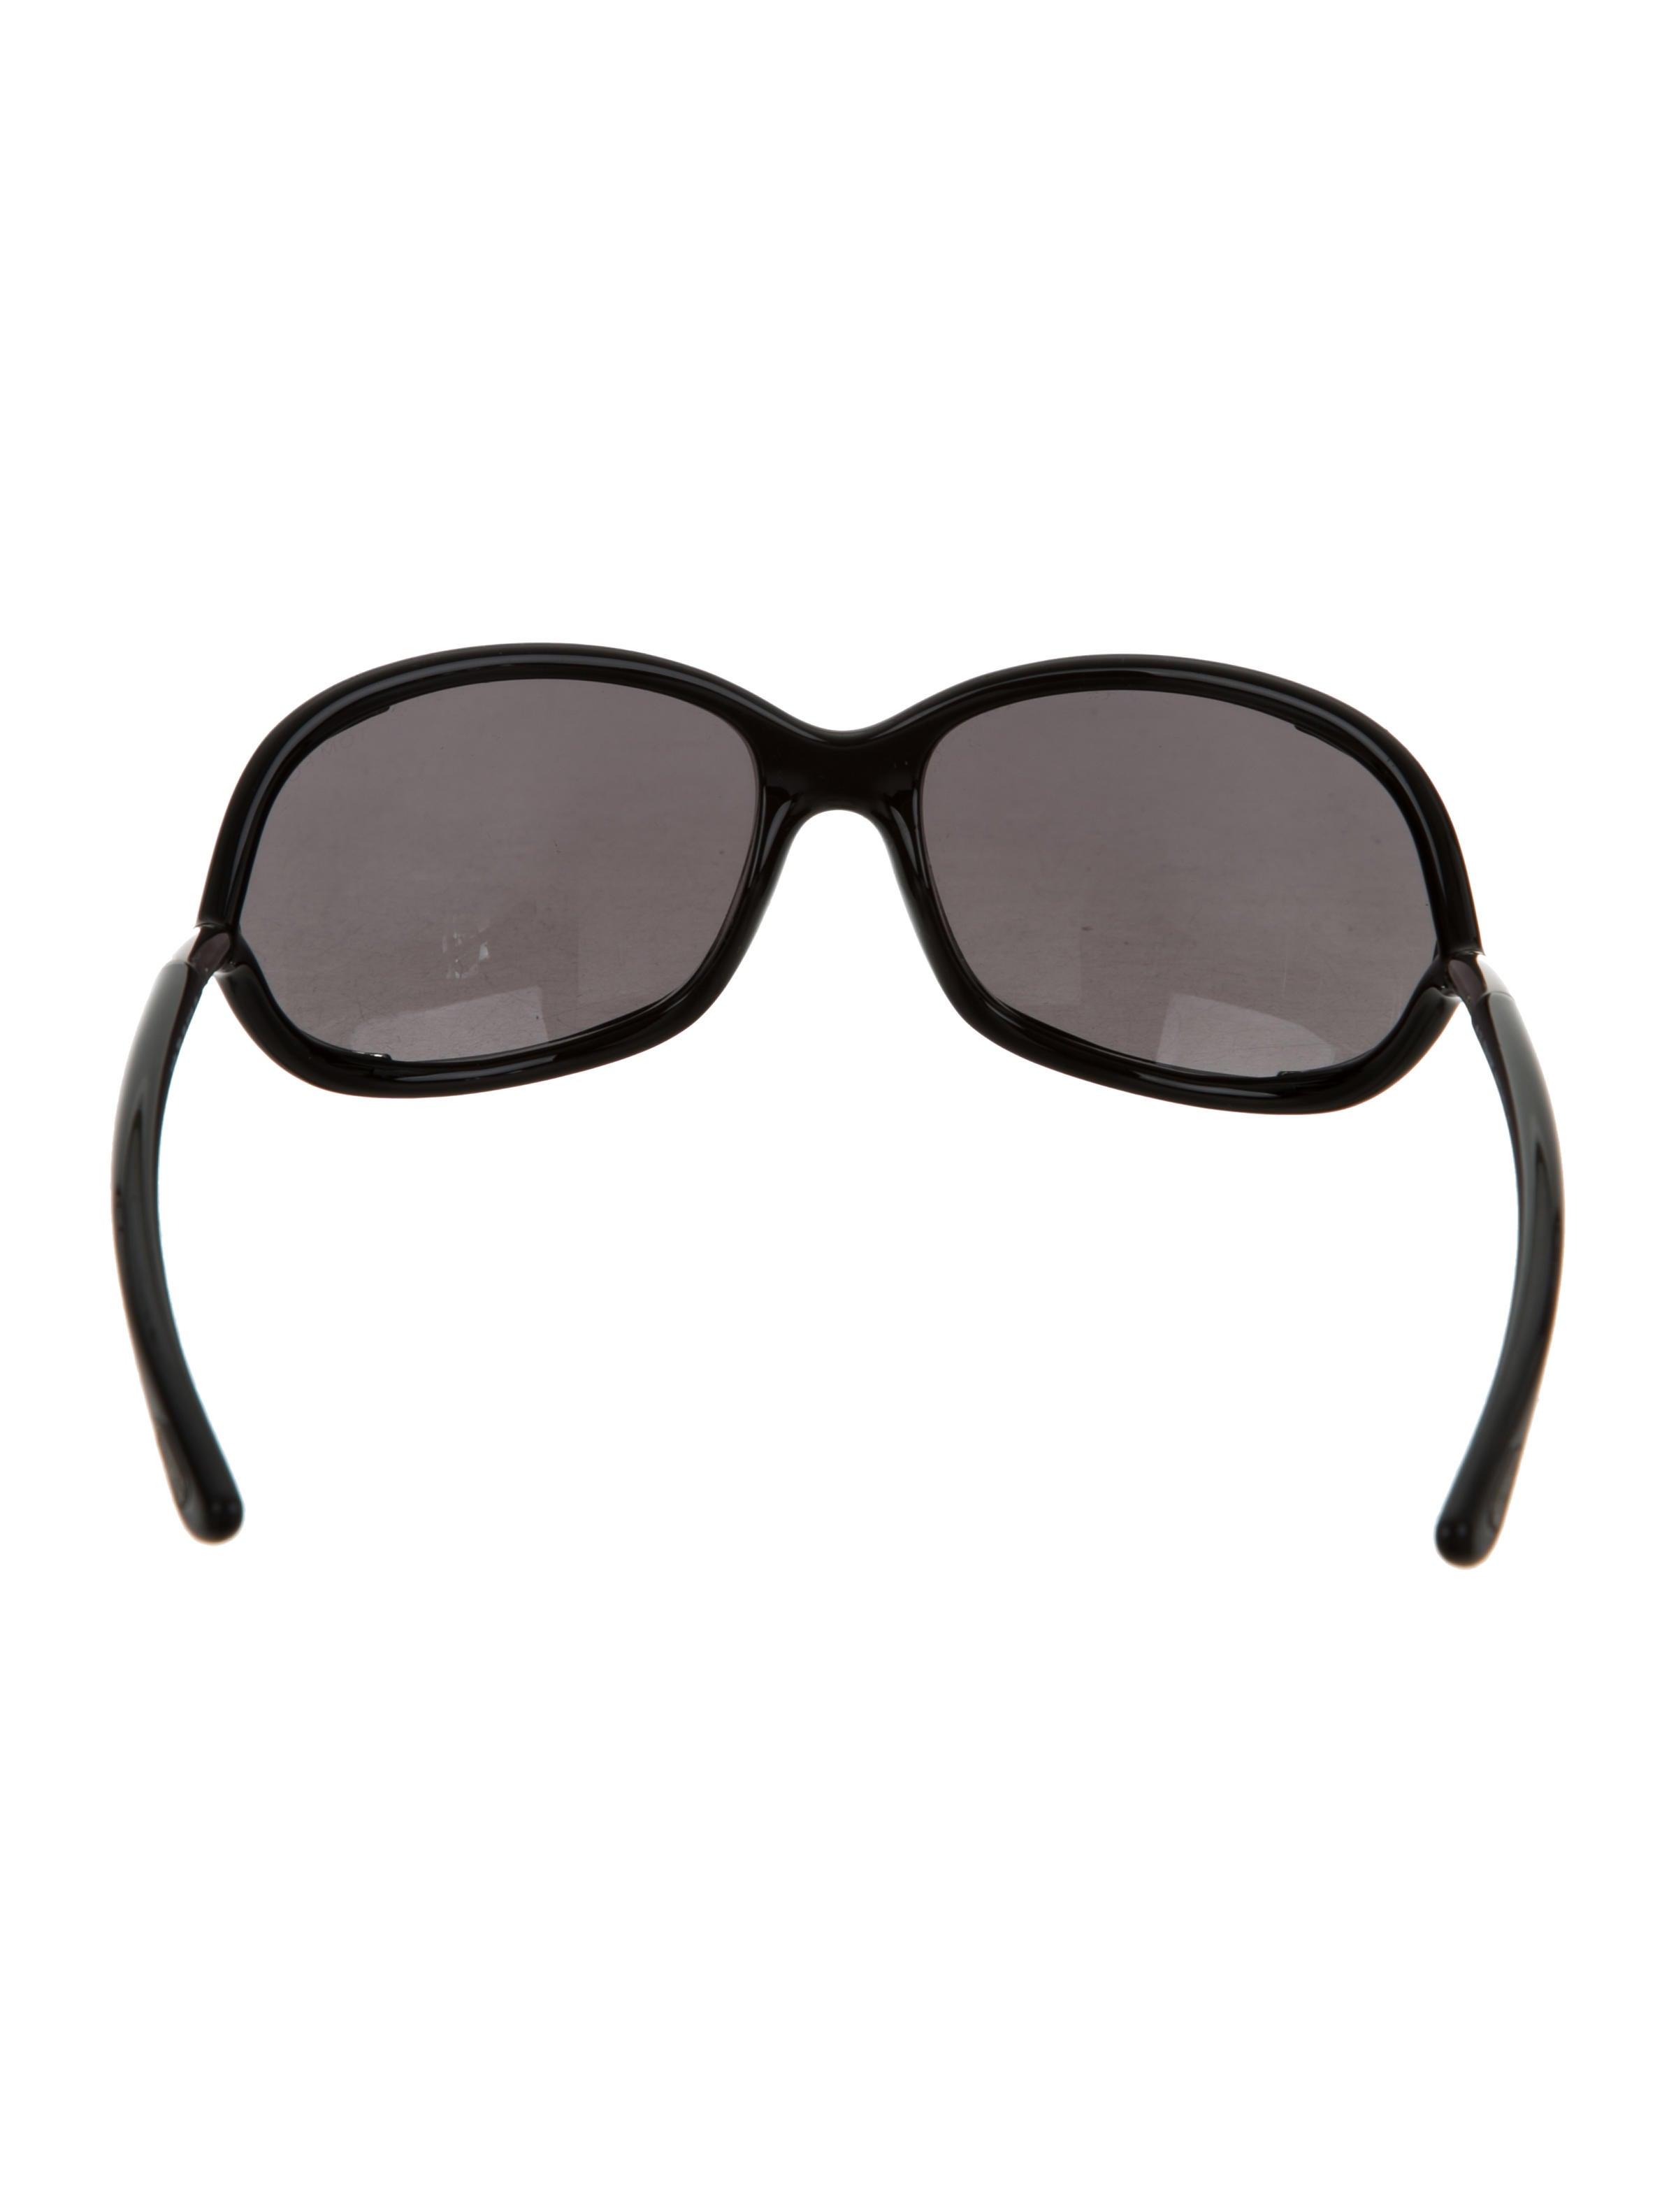 d4a32e0f94 Lyst - Tom Ford Jennifer Opentemple Sunglasses Blackgunmetal in Black Tom  Ford Jennifer Oversize Sunglasses - Accessories - TOM33391